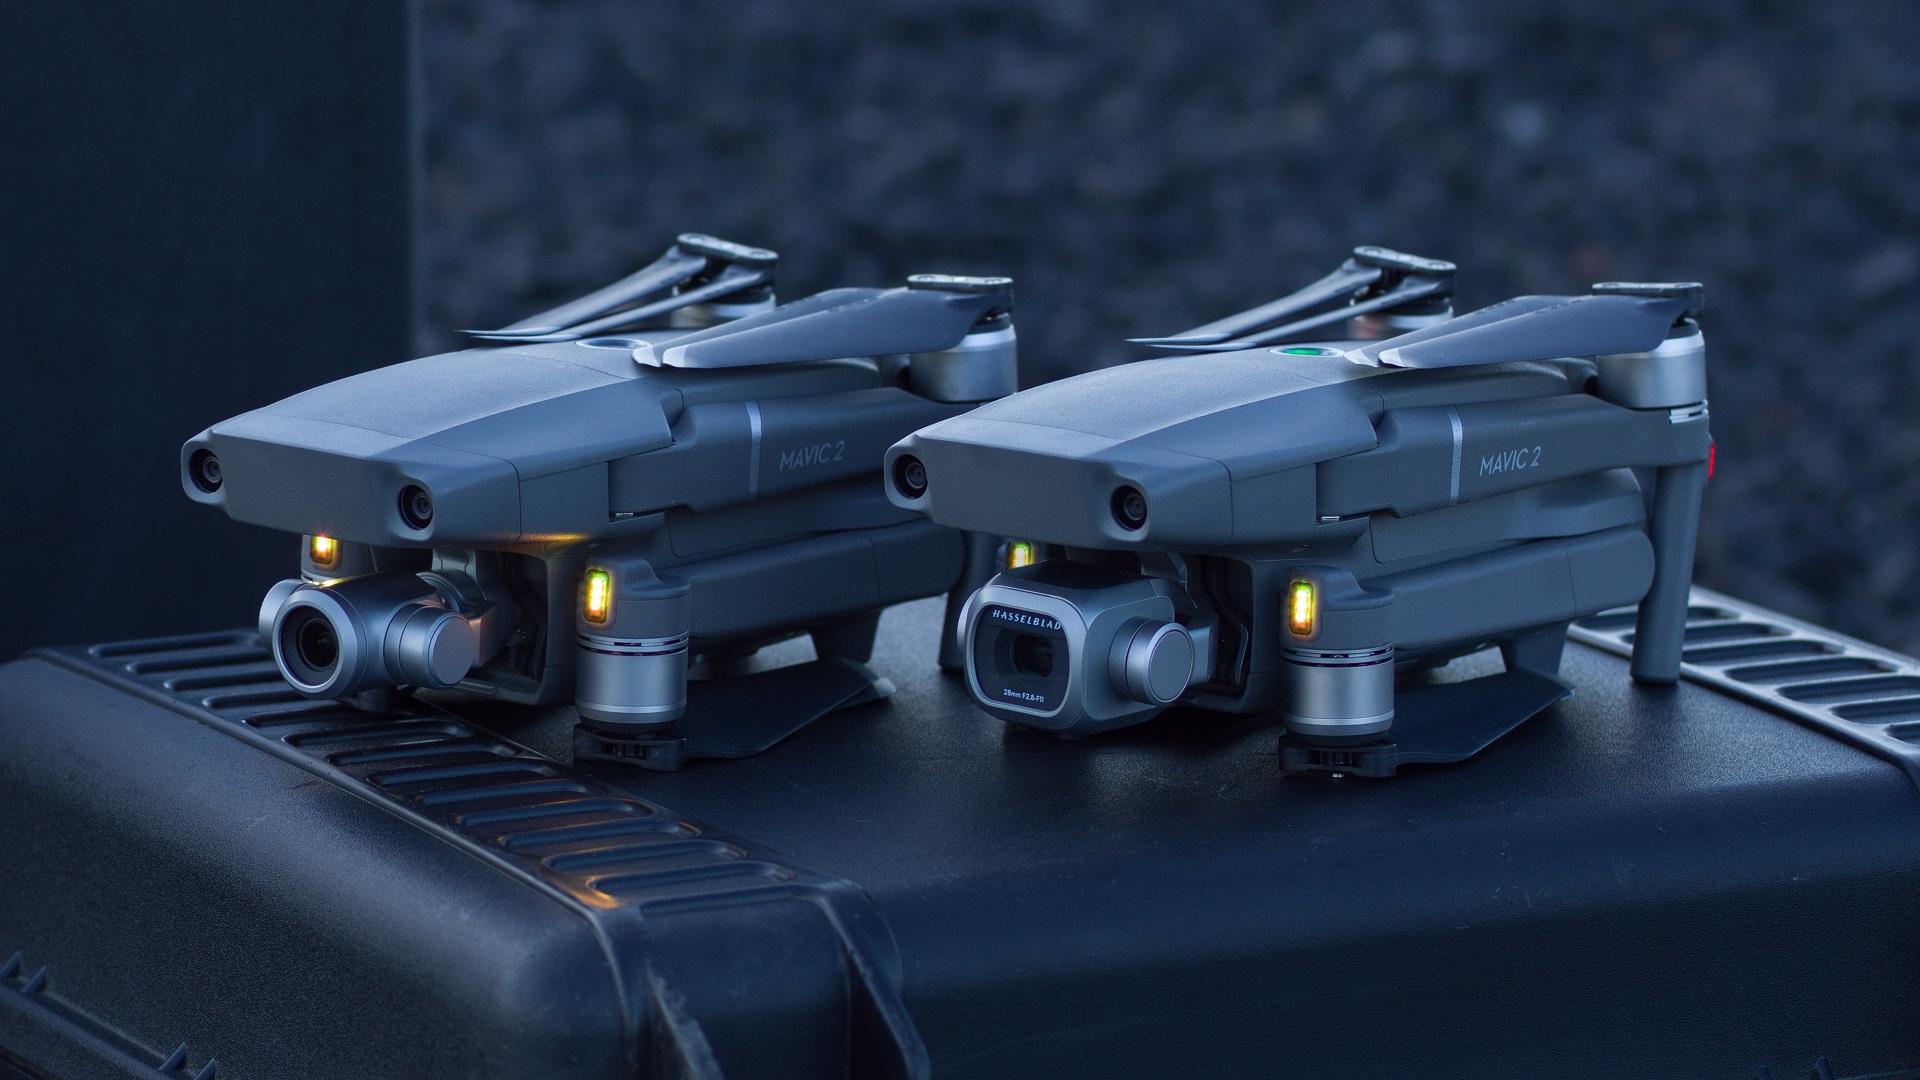 Nový dron DJI Mavic 2 Zoom za výjimečnou cenu u Gearbestu! [sponzorovaný článek]